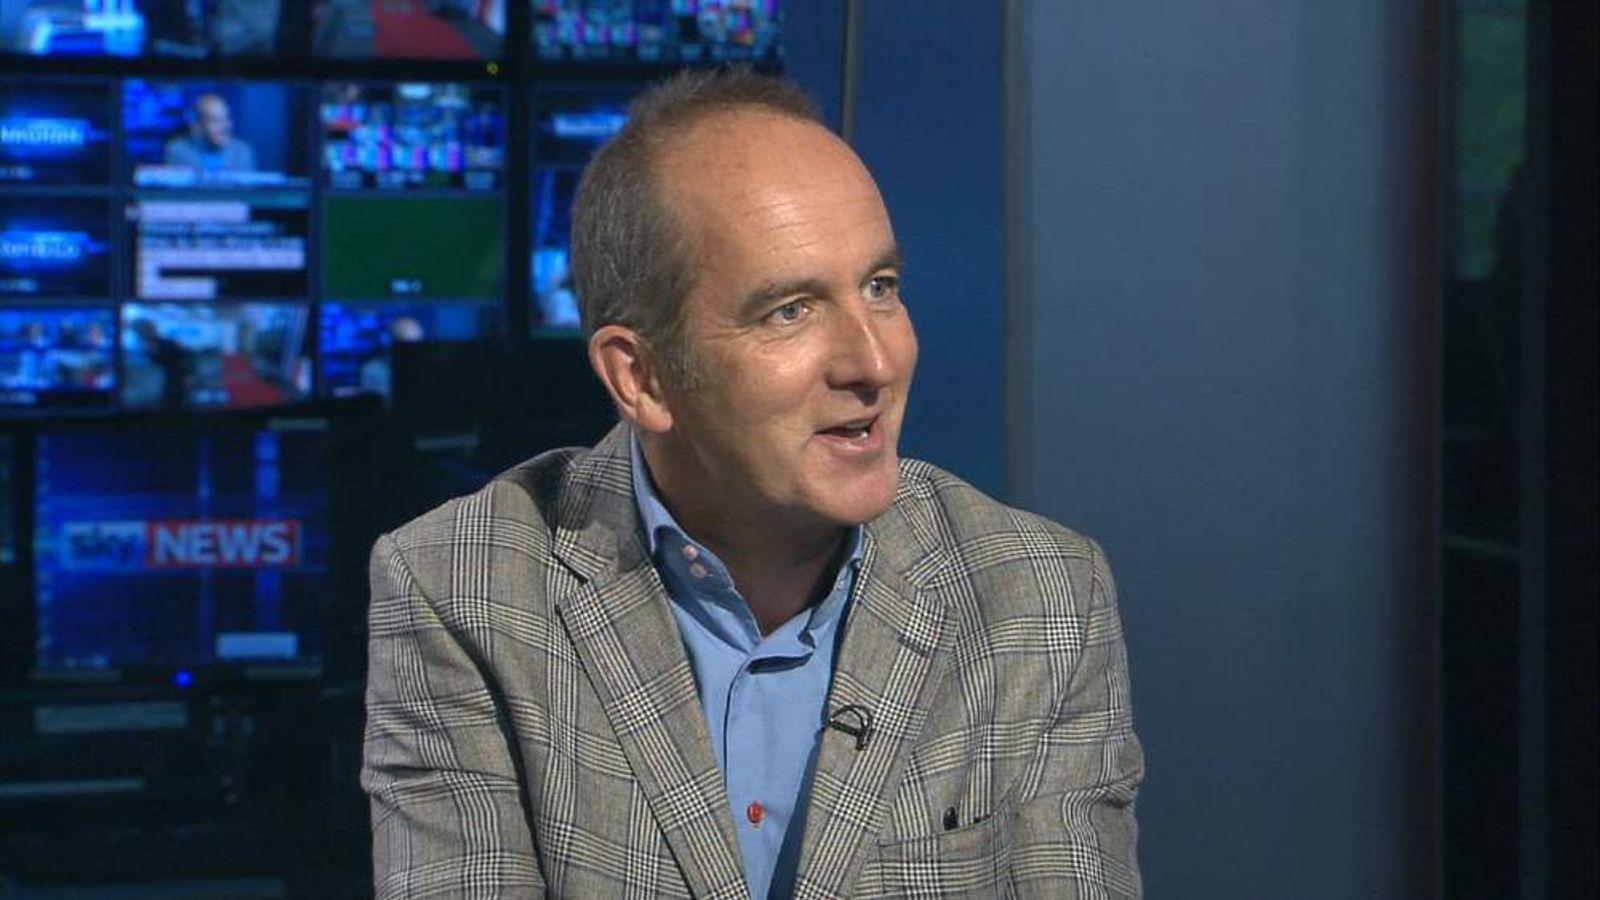 Designer and presenter Kevin McCloud on the UK housing market